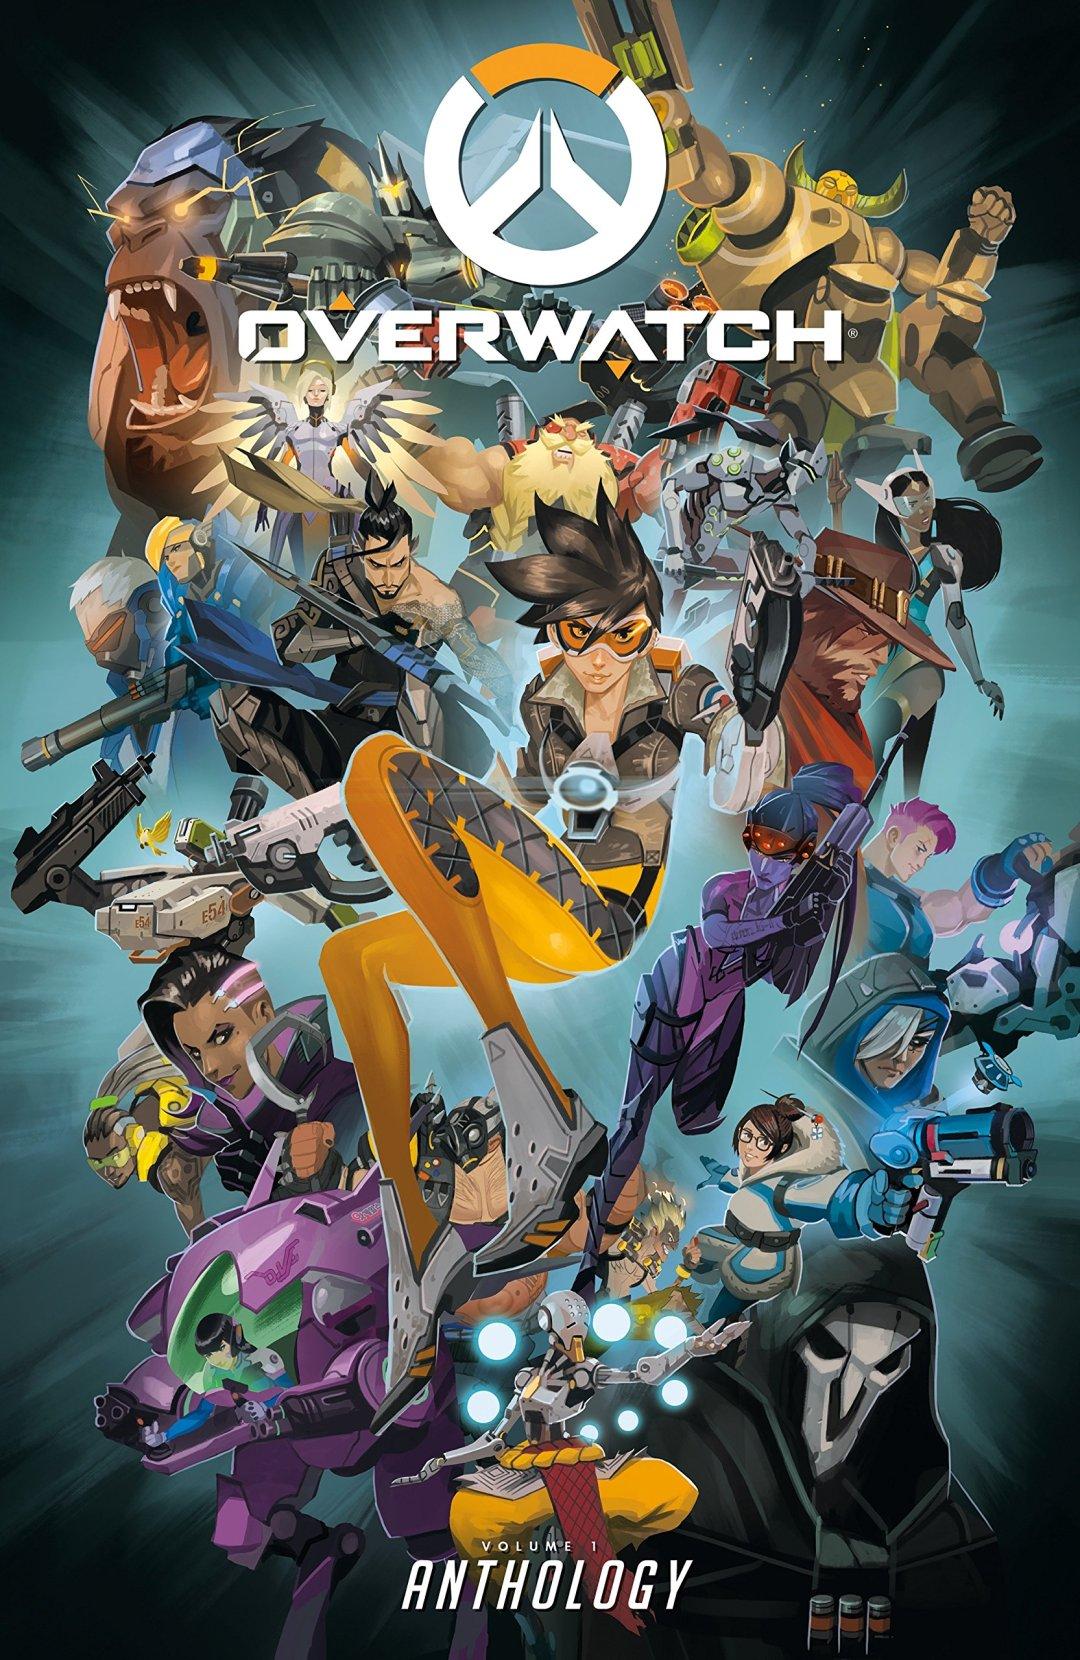 Amazon.com: Overwatch: Anthology (9781506705408): BLIZZARD ENTERTAINMENT, Burns, Matt, Brooks, Roberts, Robinson, Andrew, Neilson, Micky: Books